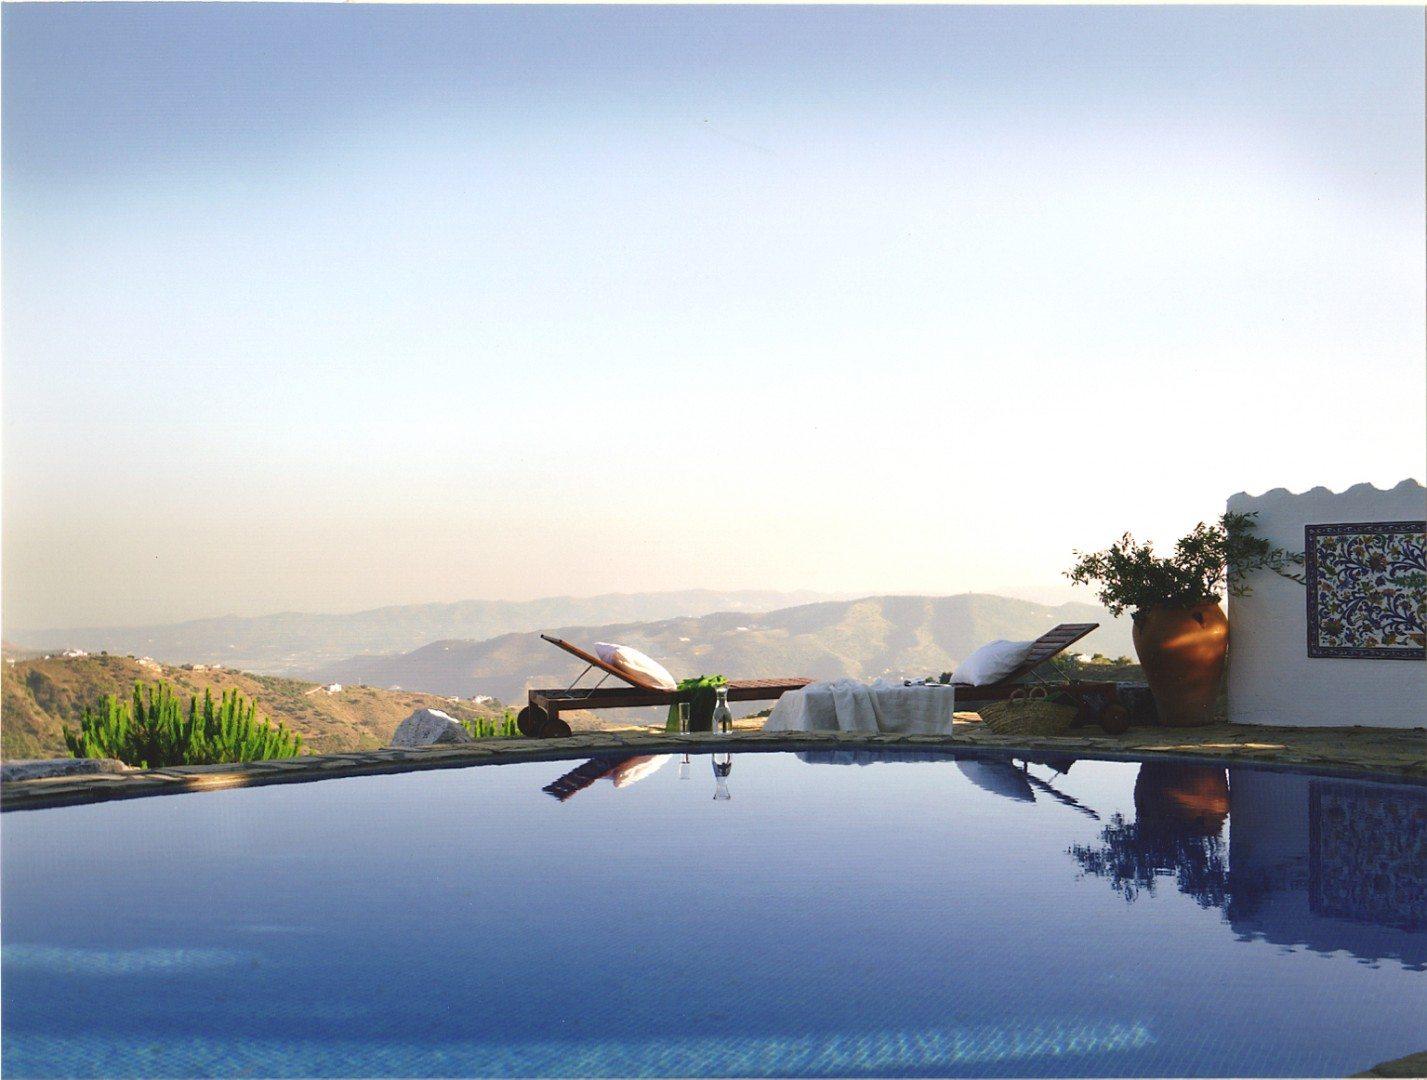 Luxury-Villa-Pool-Europe-Carpe-Diem-Luxury-Travel-UltraVilla